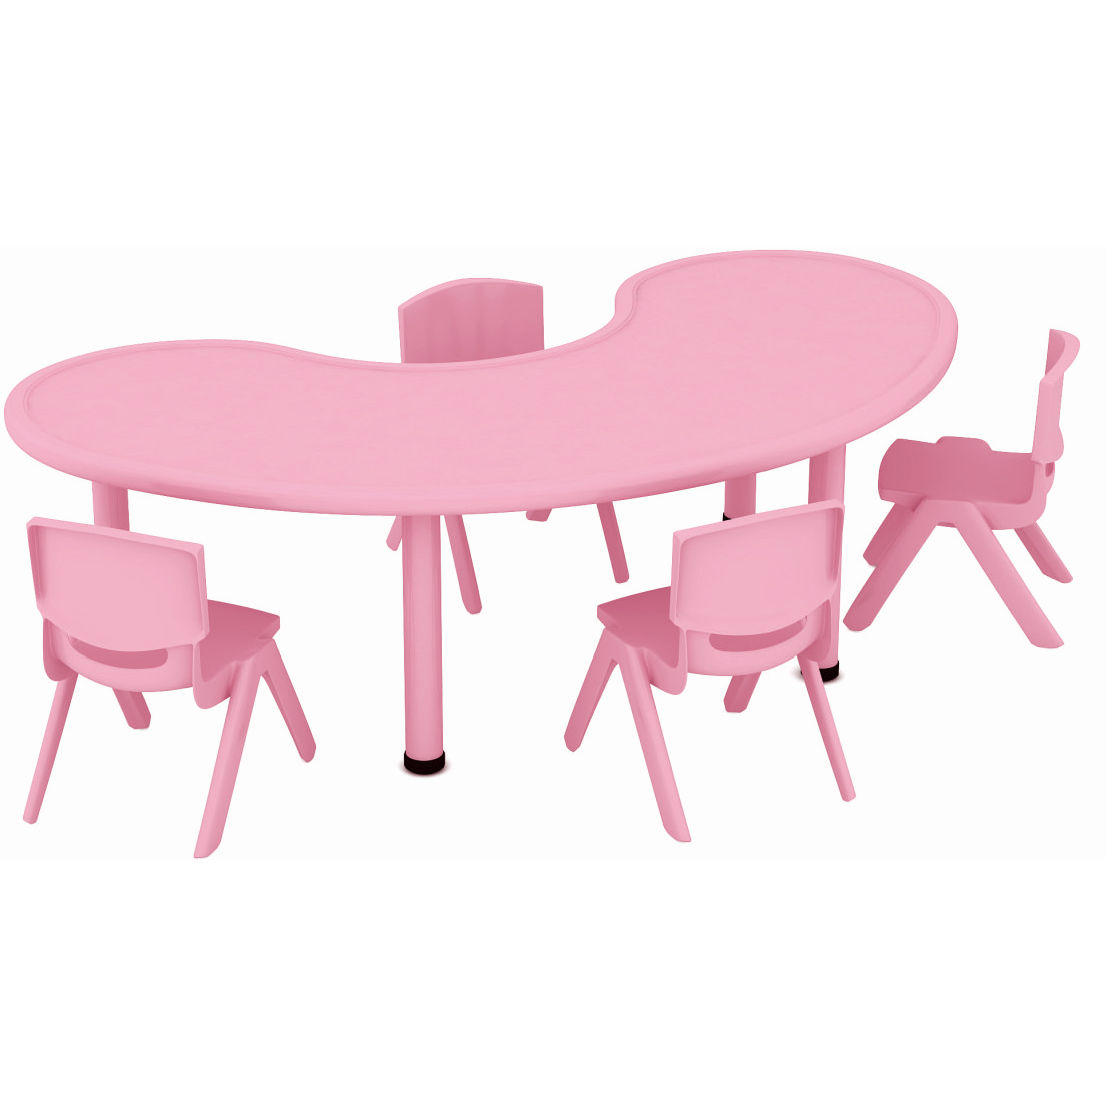 Moon Shape Furniture Set Six Seats Plastic Children's Deak and Chairs